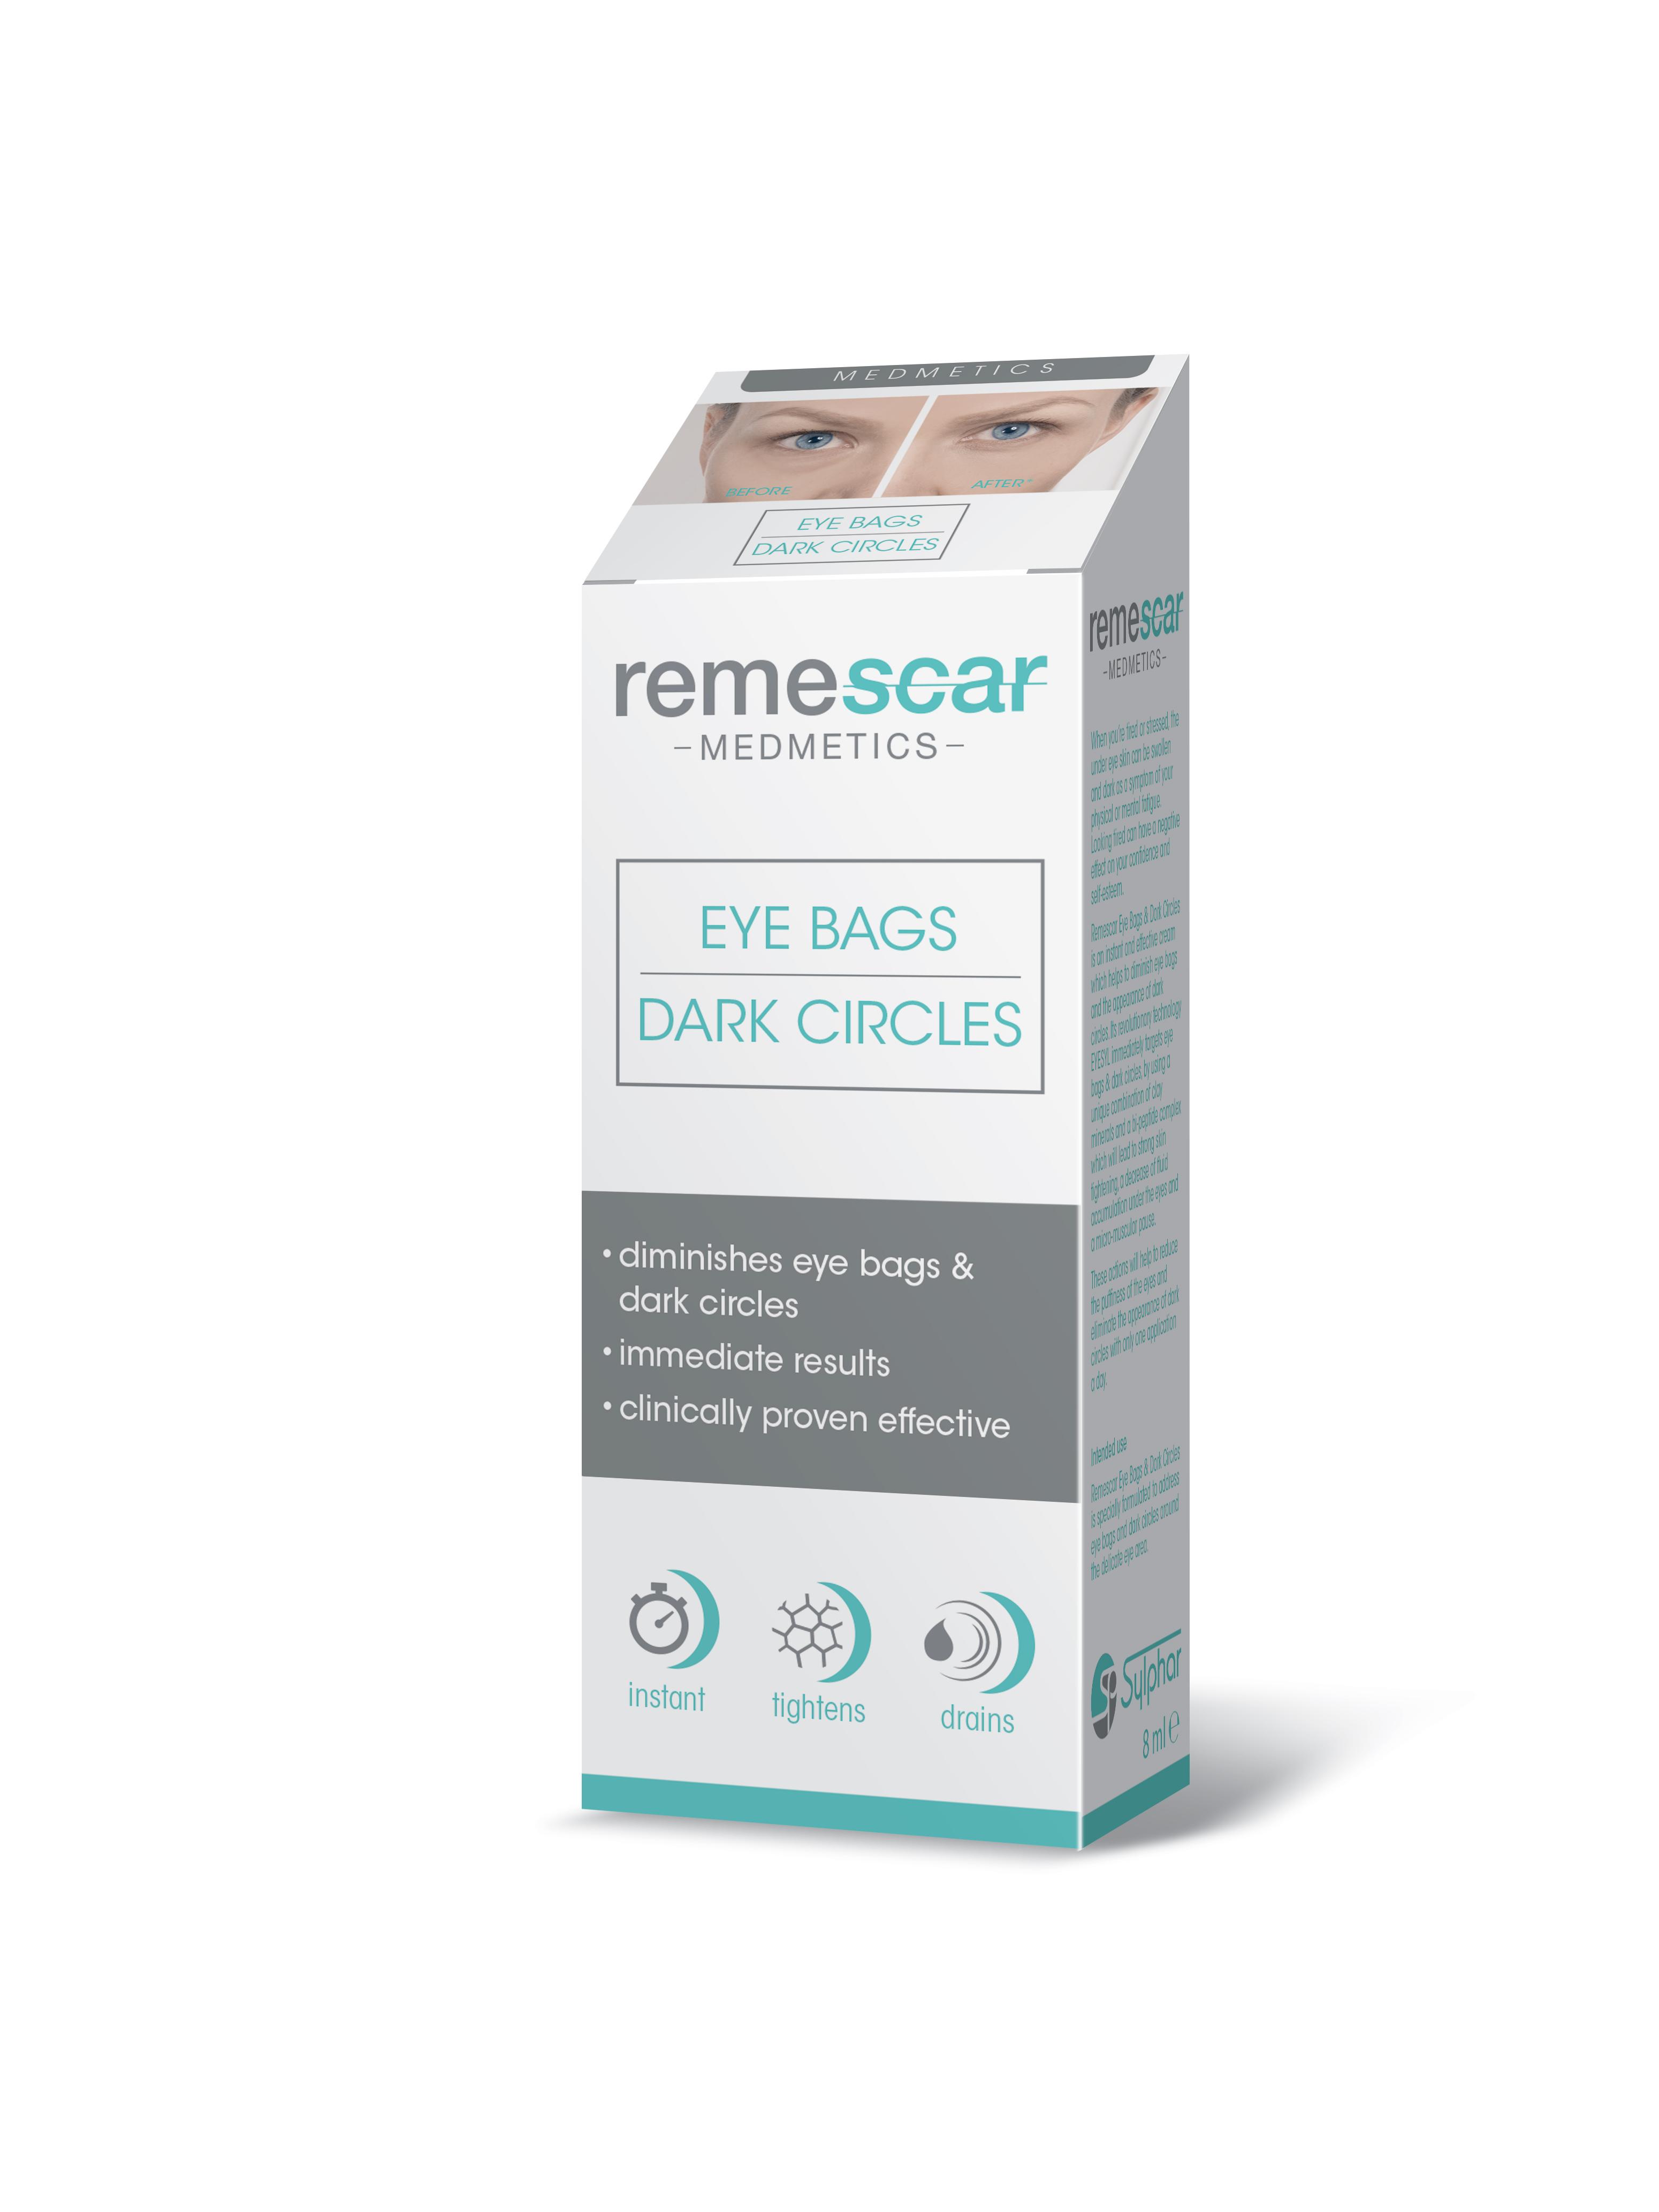 Crema Remescar Eye Bags, Dark Circles